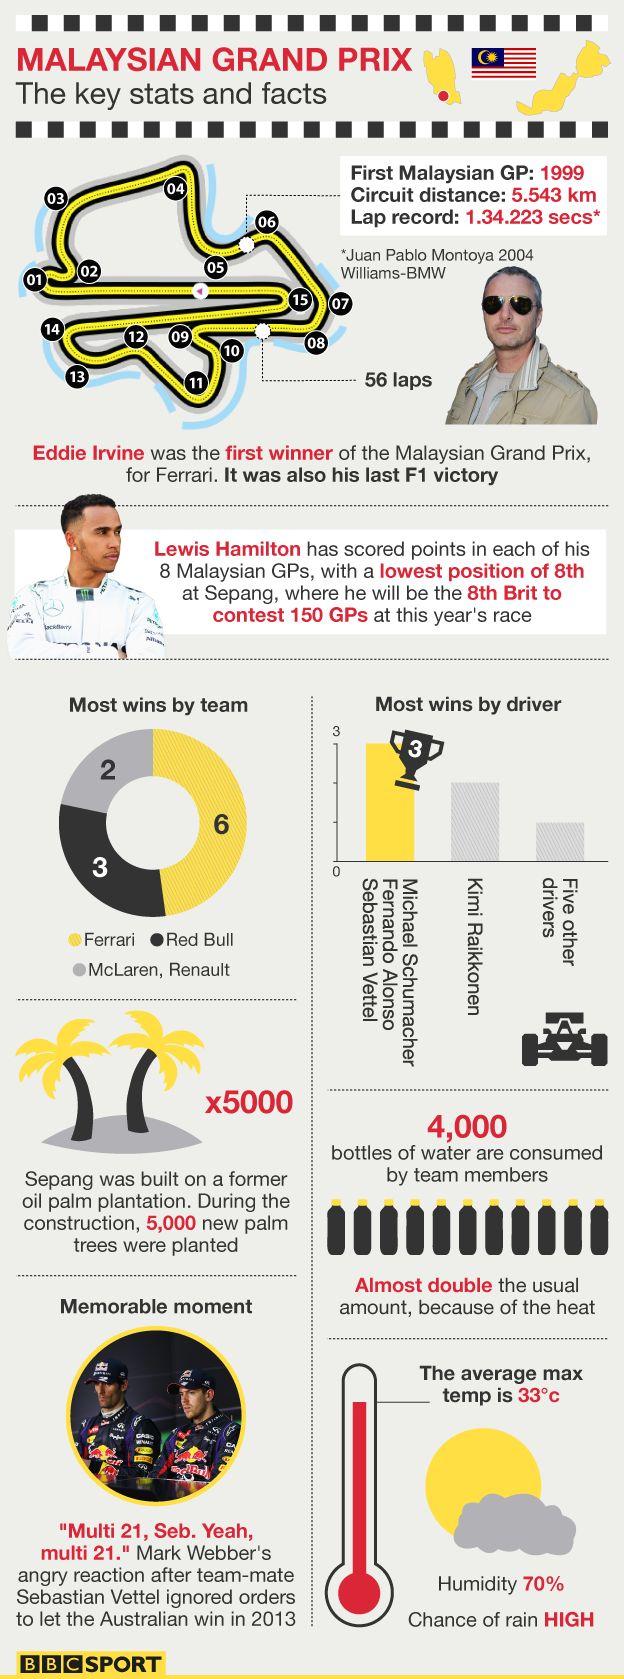 Malaysian Grand Prix facts